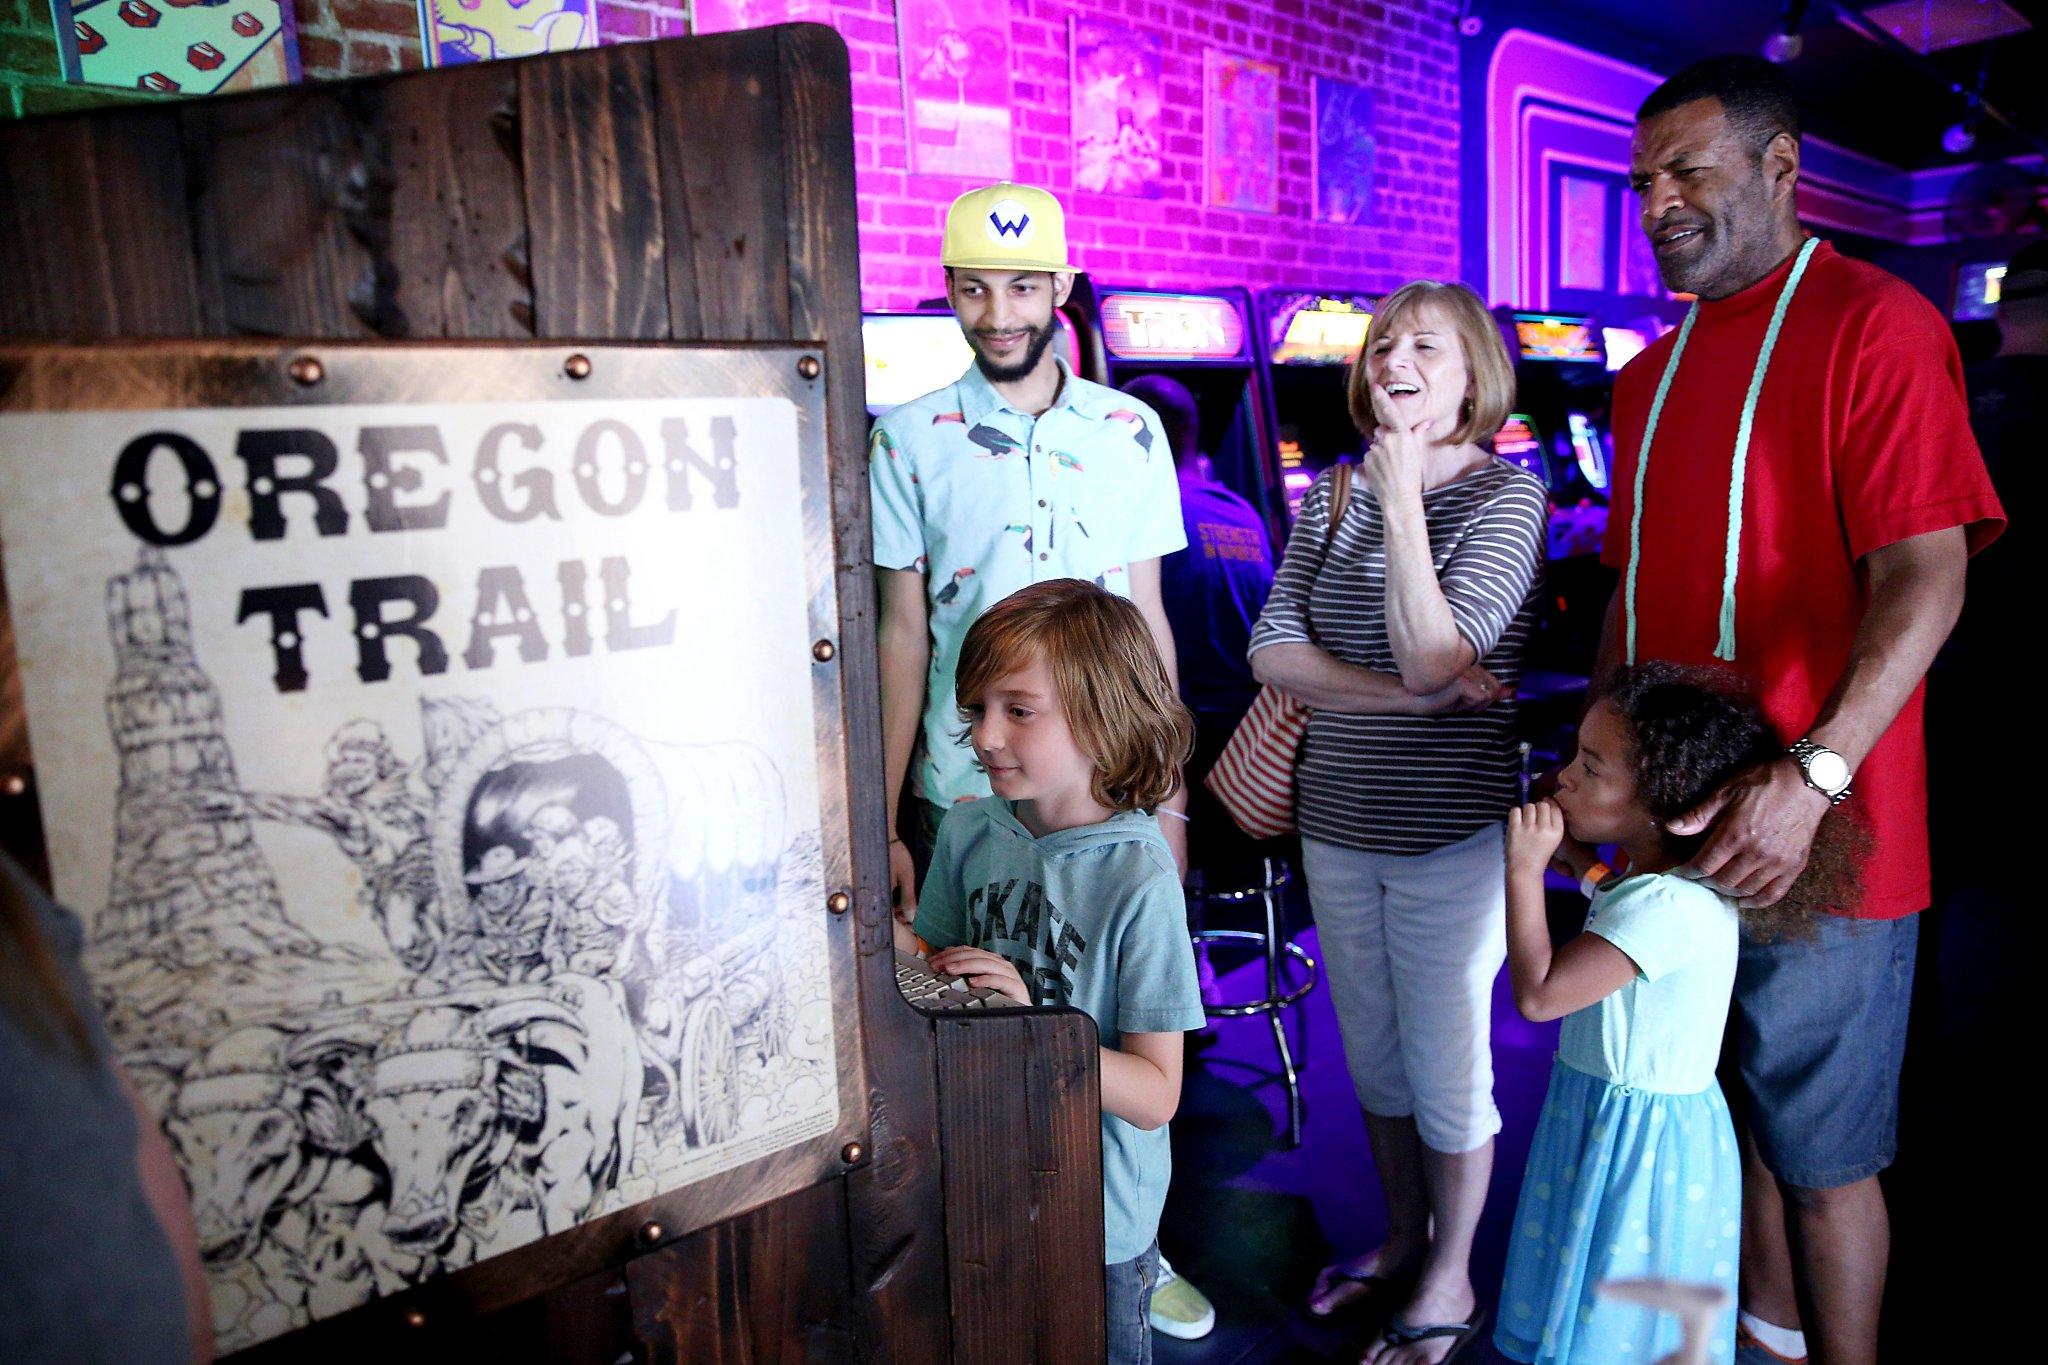 Oregon Trail' as art, computer classic returns as custom